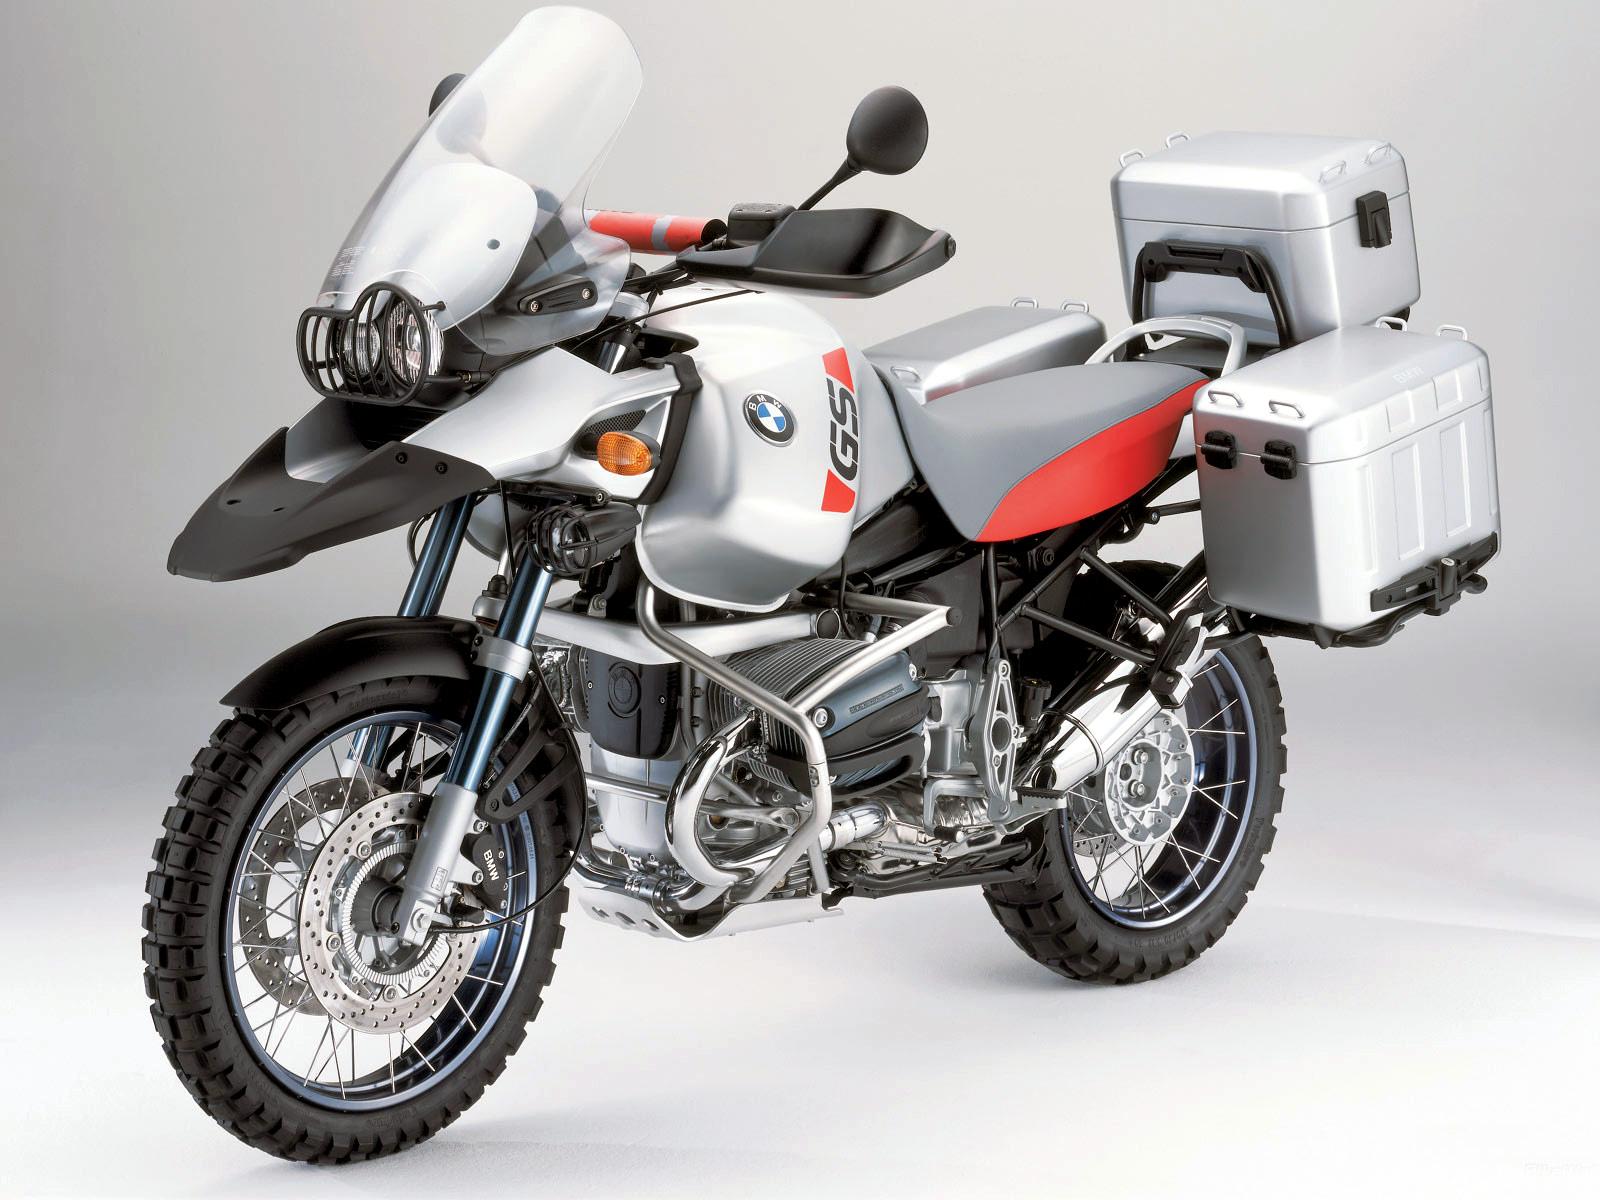 2001 bmw r1150 gs adventure motorcycle desktop wallpaper. Black Bedroom Furniture Sets. Home Design Ideas